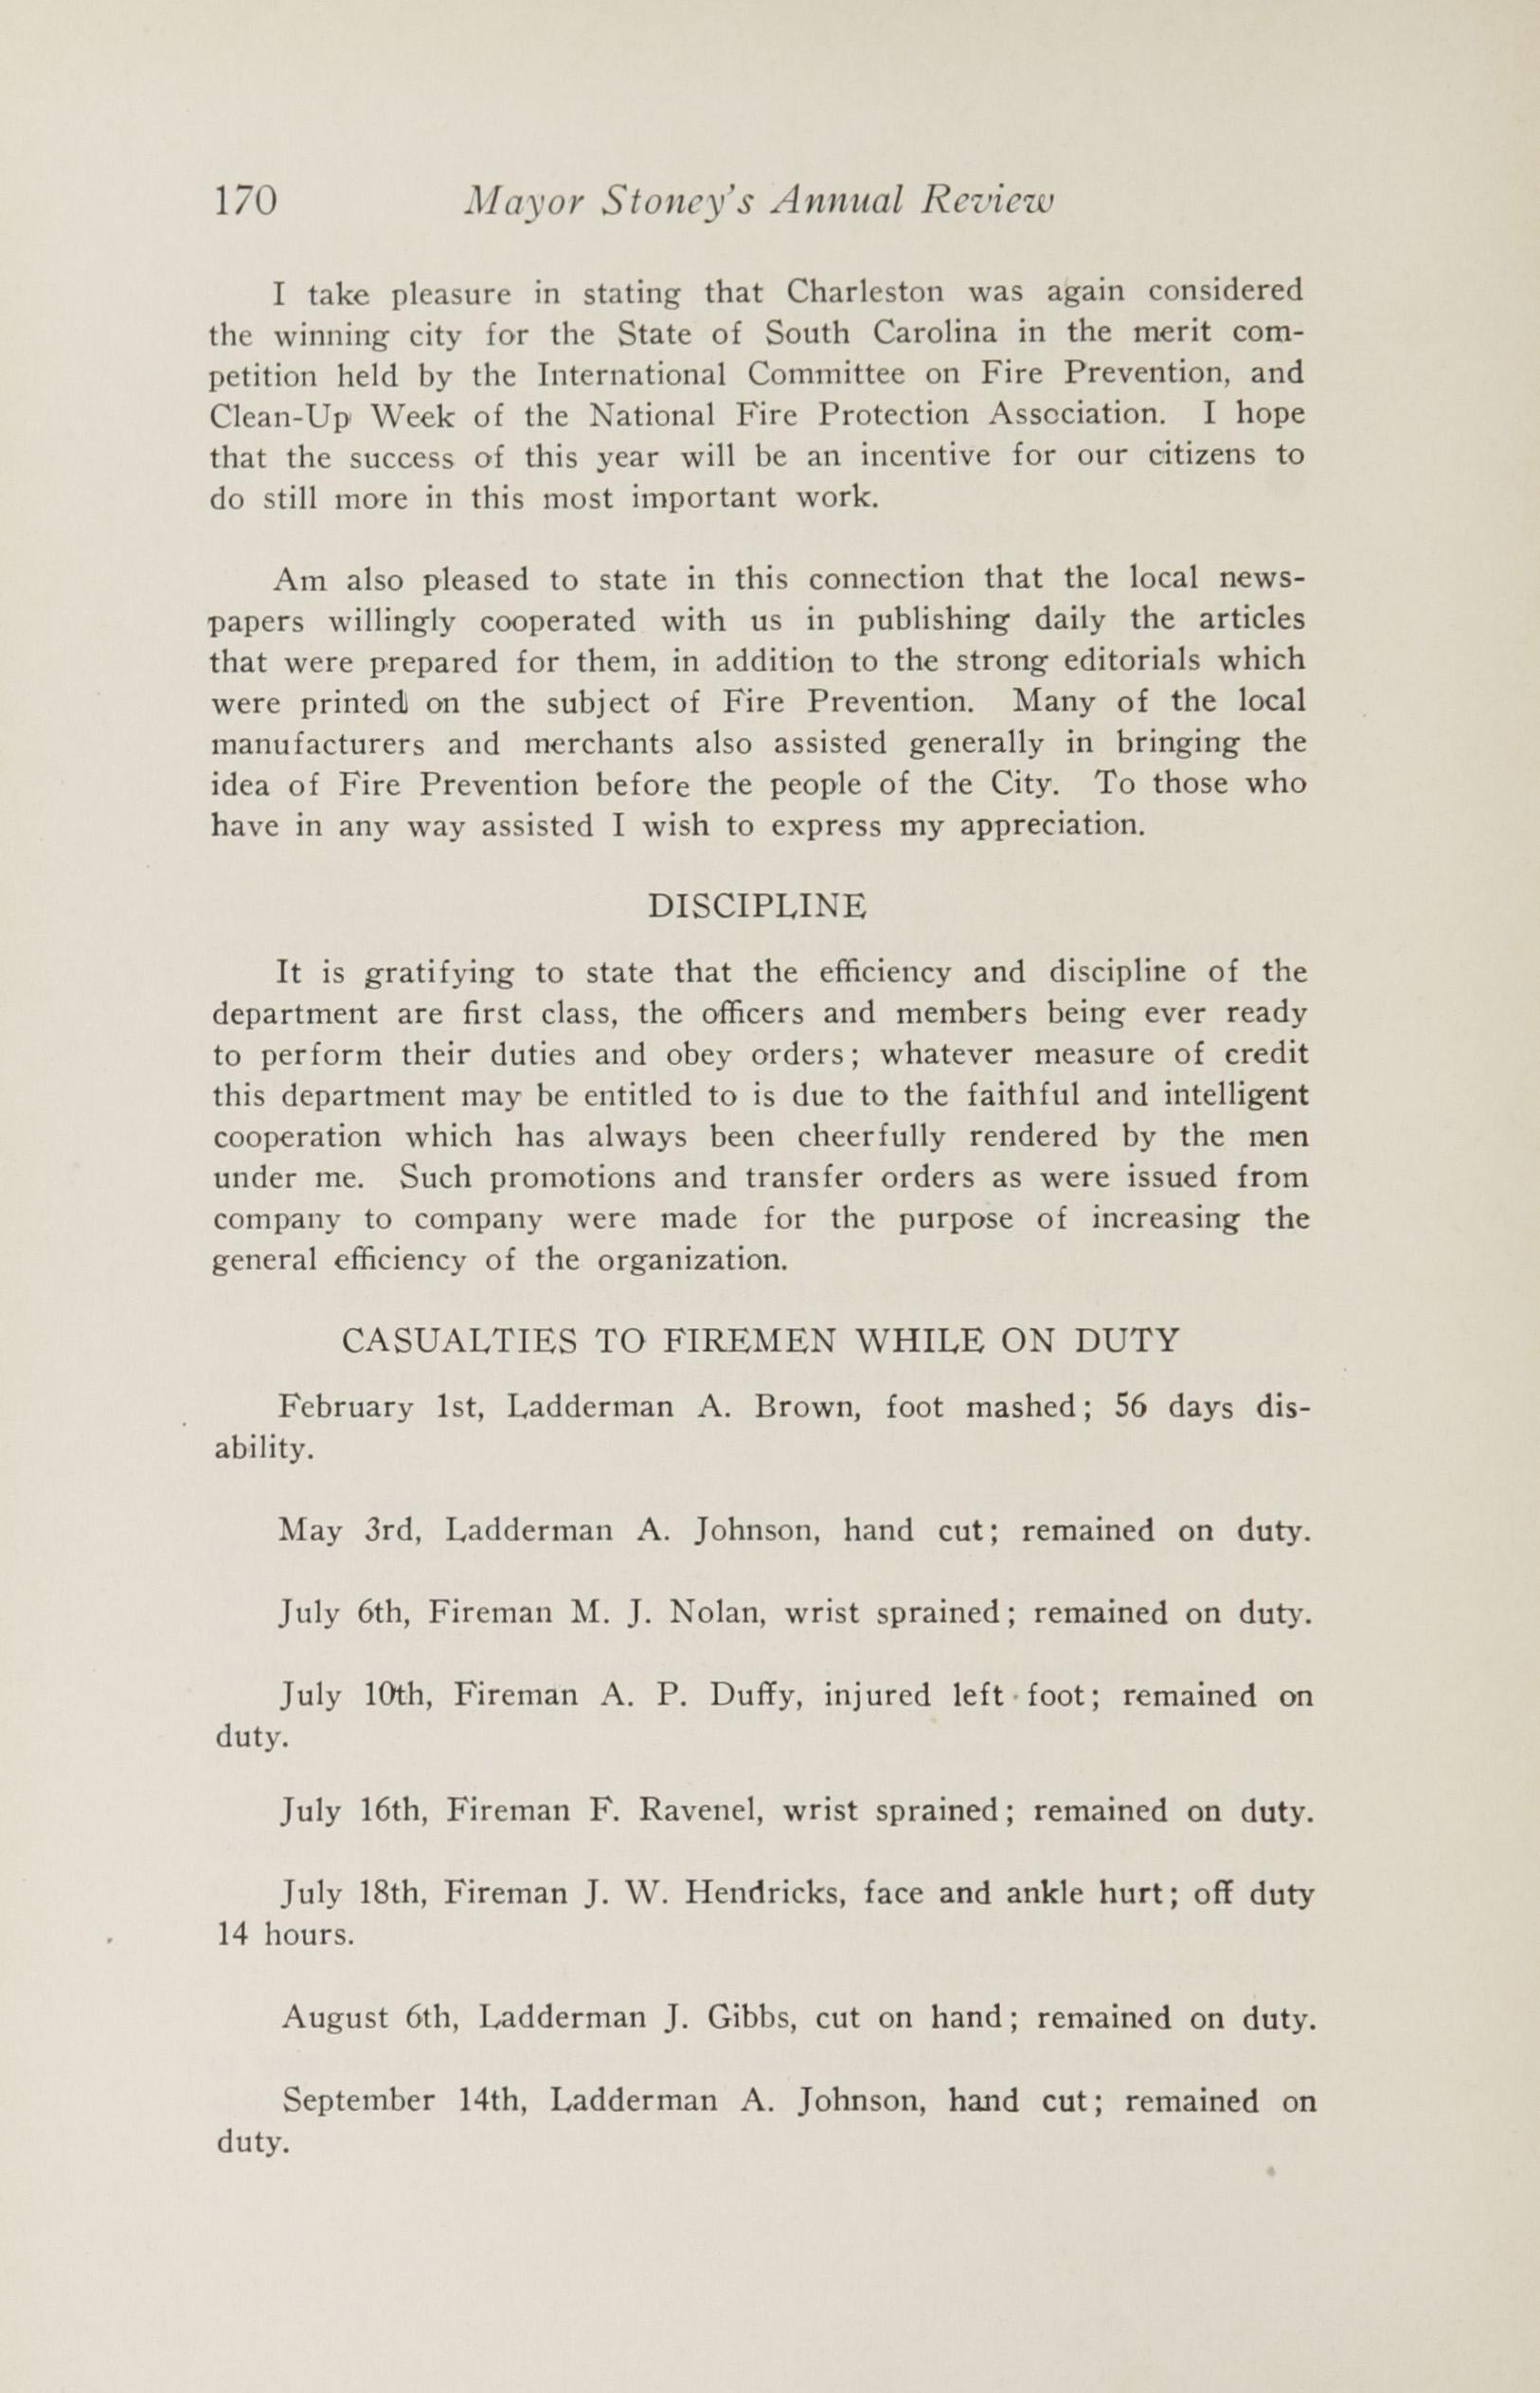 Charleston Yearbook, 1929, page 170